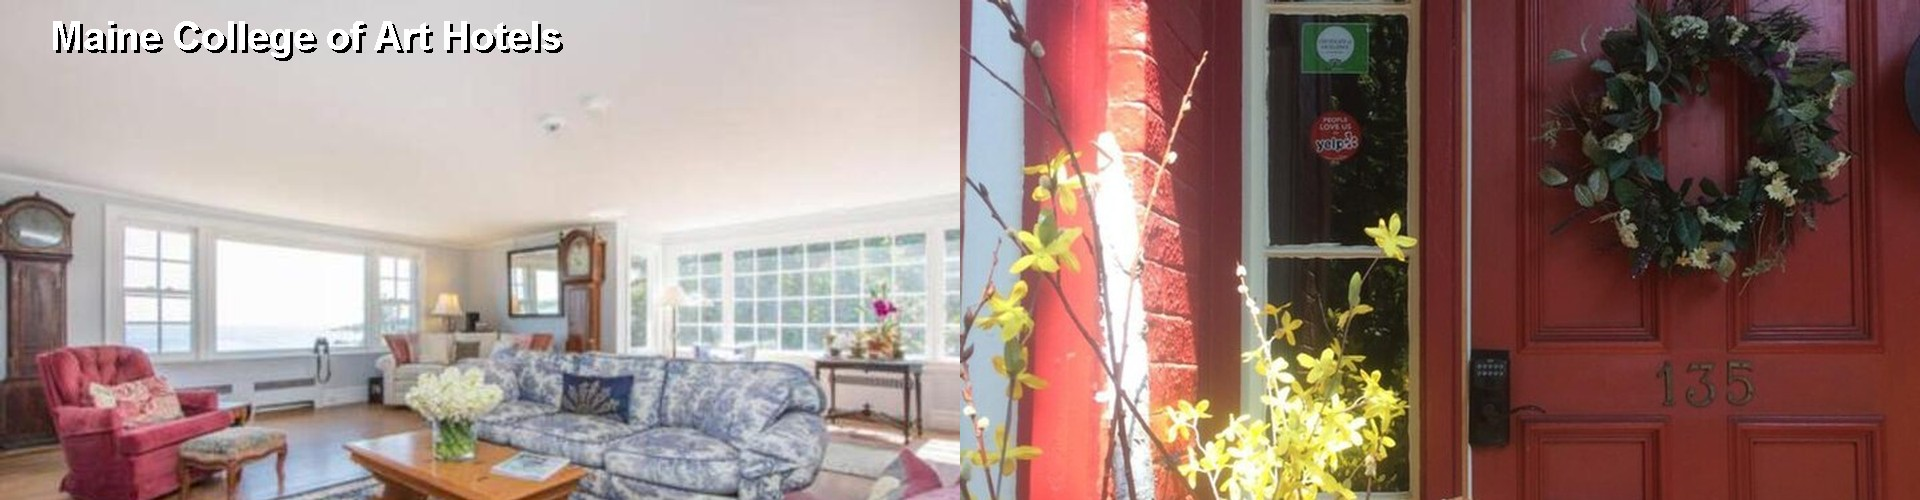 5 Best Hotels Near Maine College Of Art